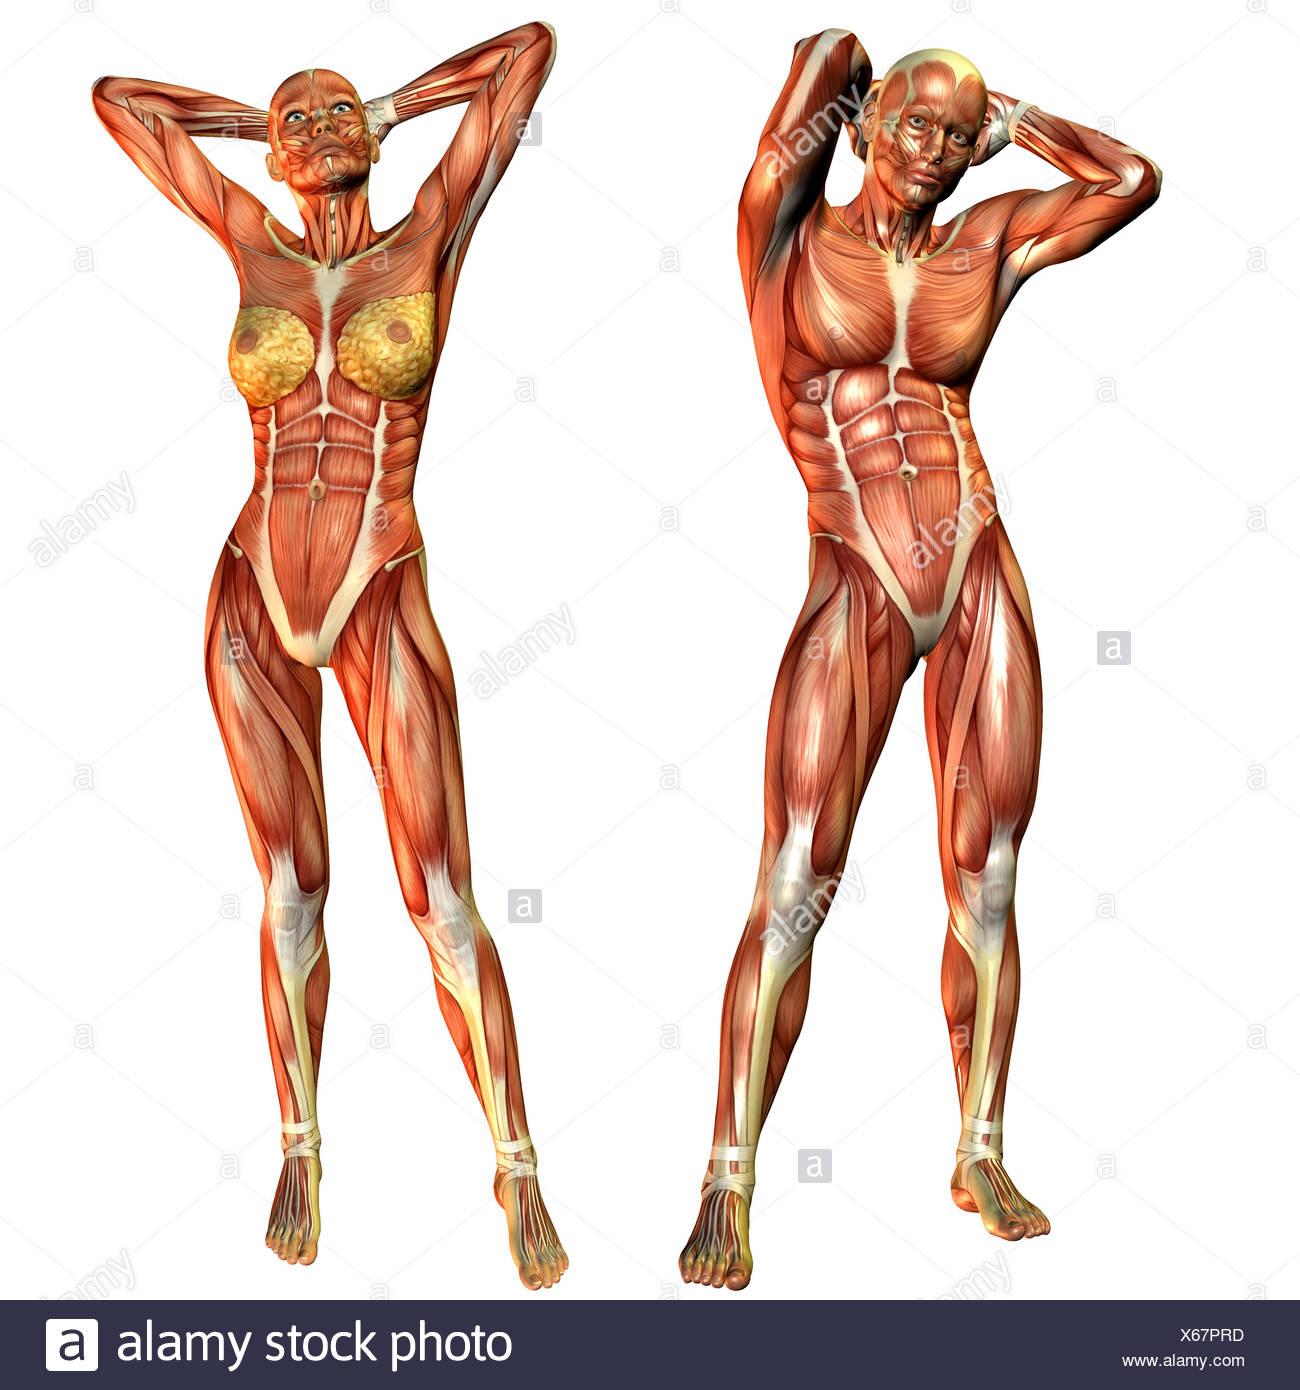 Nett Laterale Muskeln Galerie - Anatomie Ideen - finotti.info